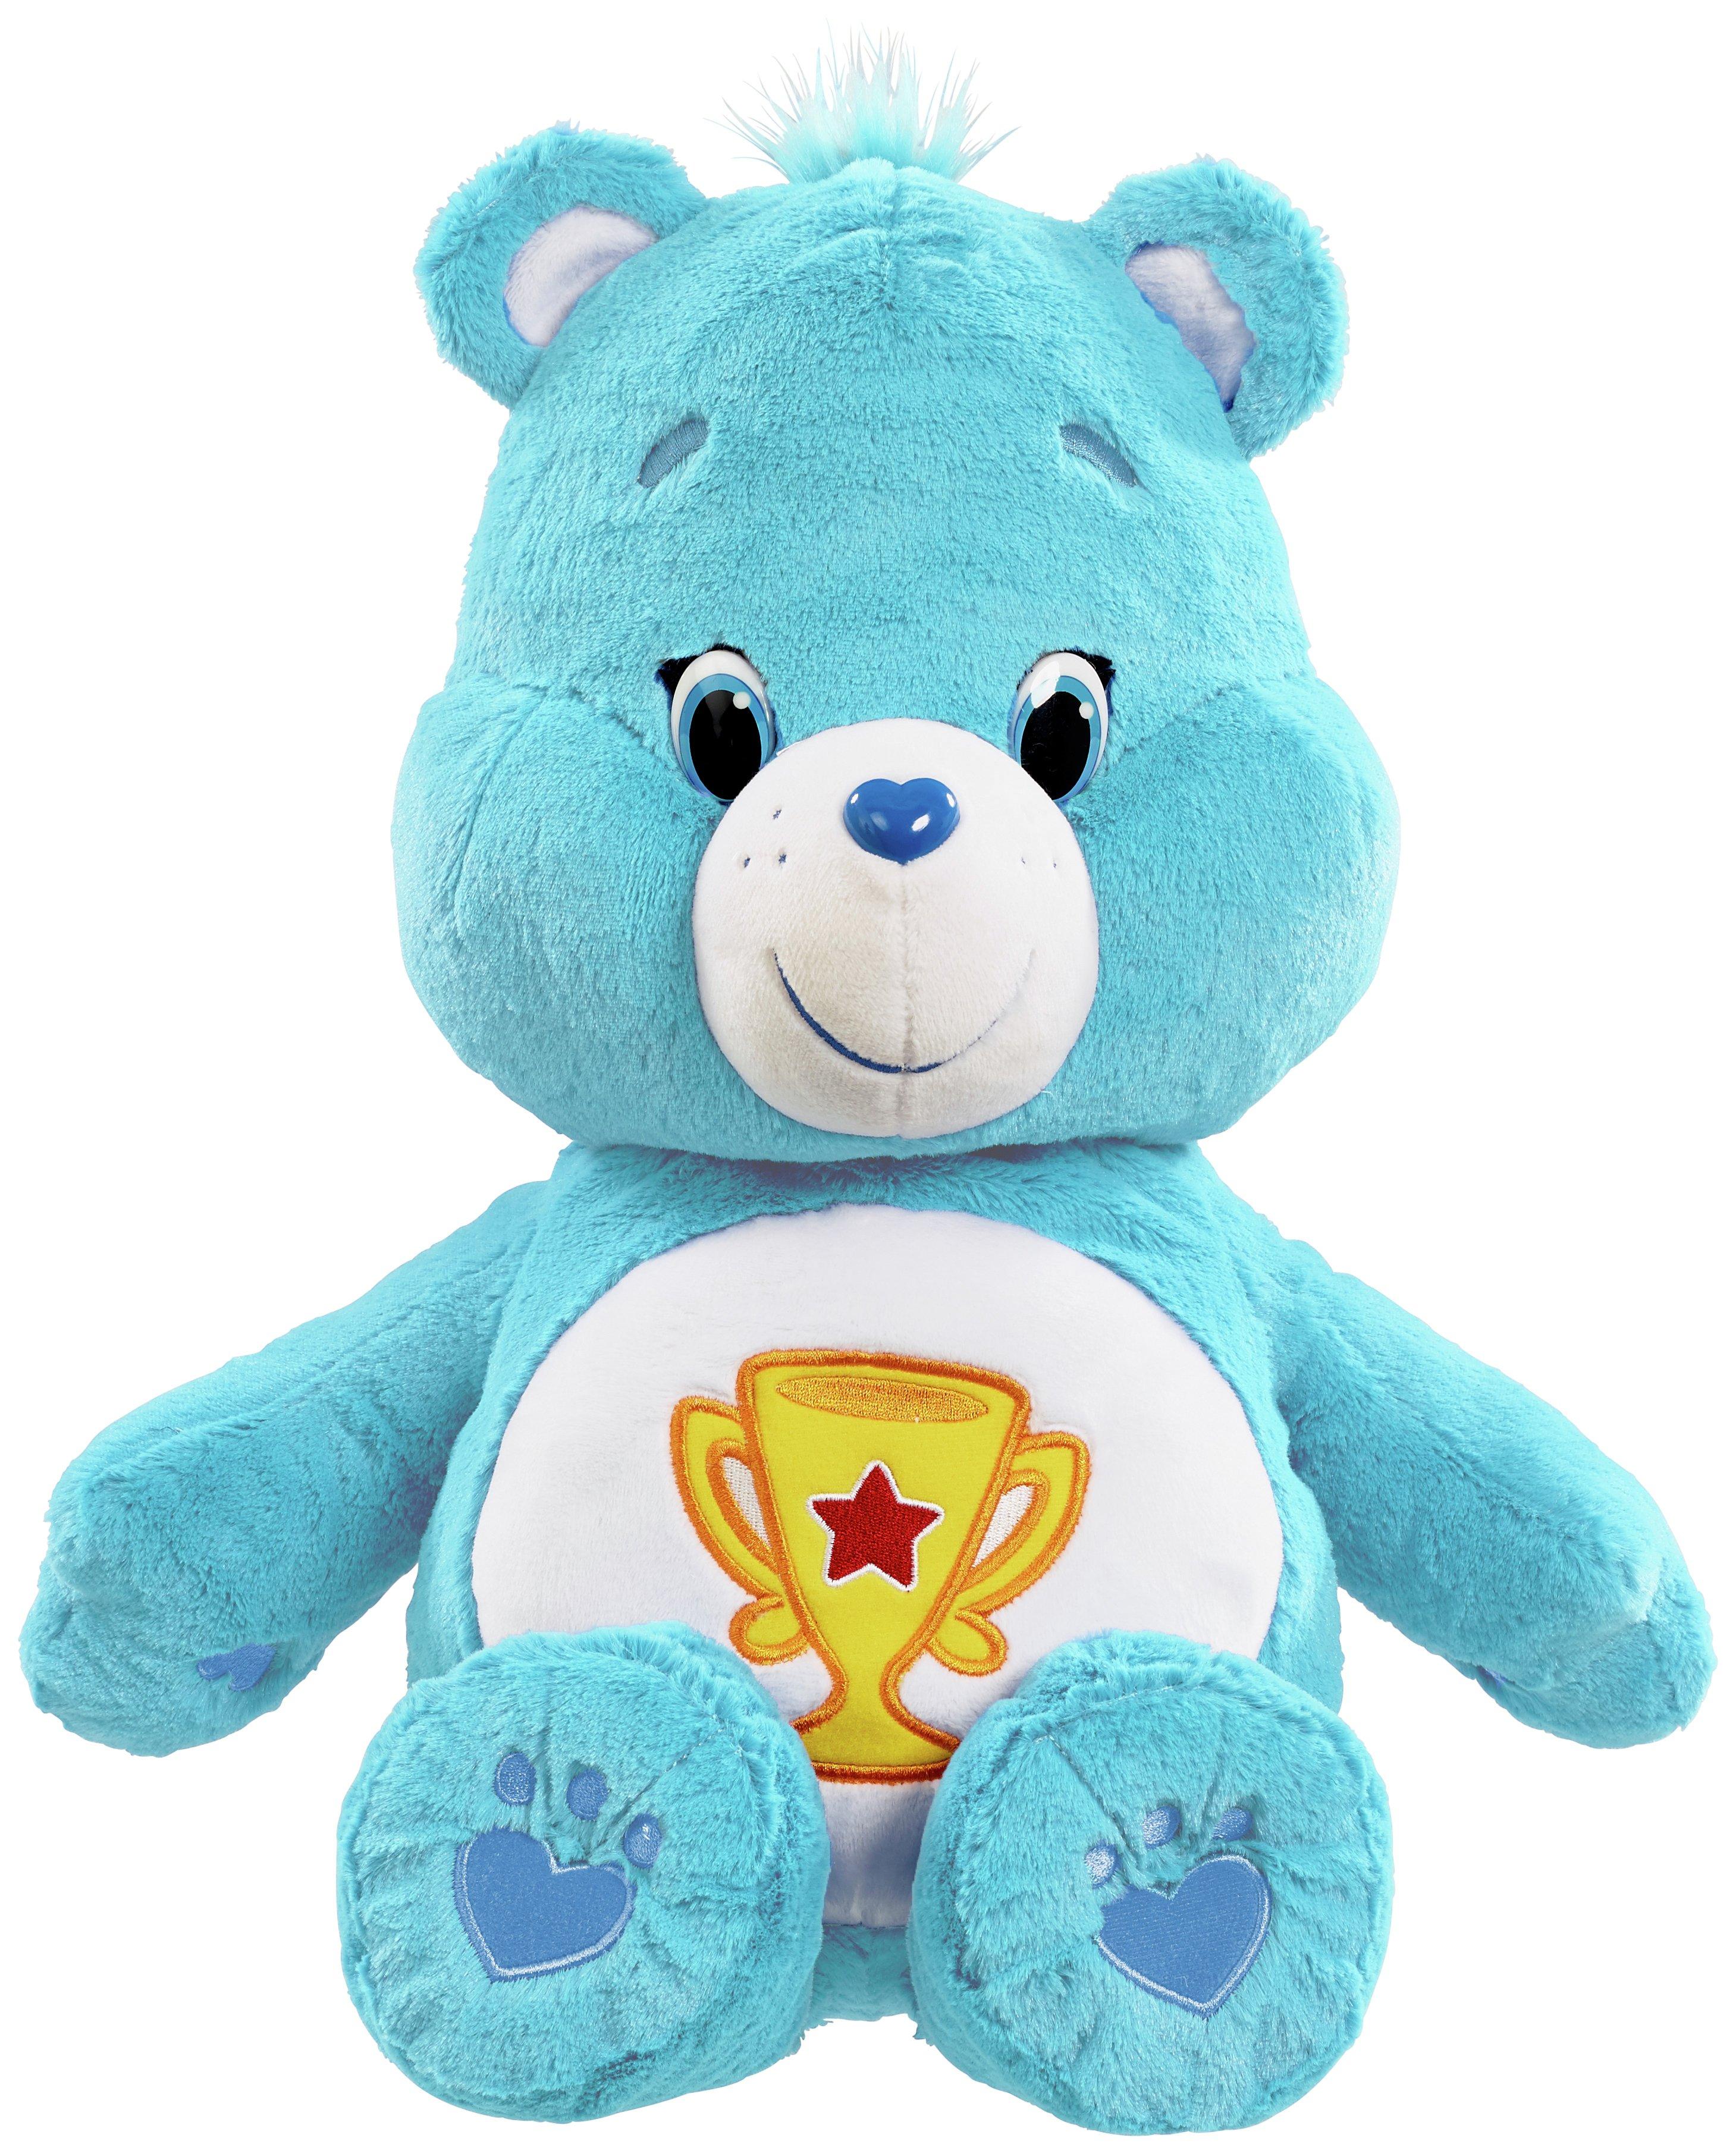 Care Bears - Bean Bag - Plush Wave 2 - Assortment